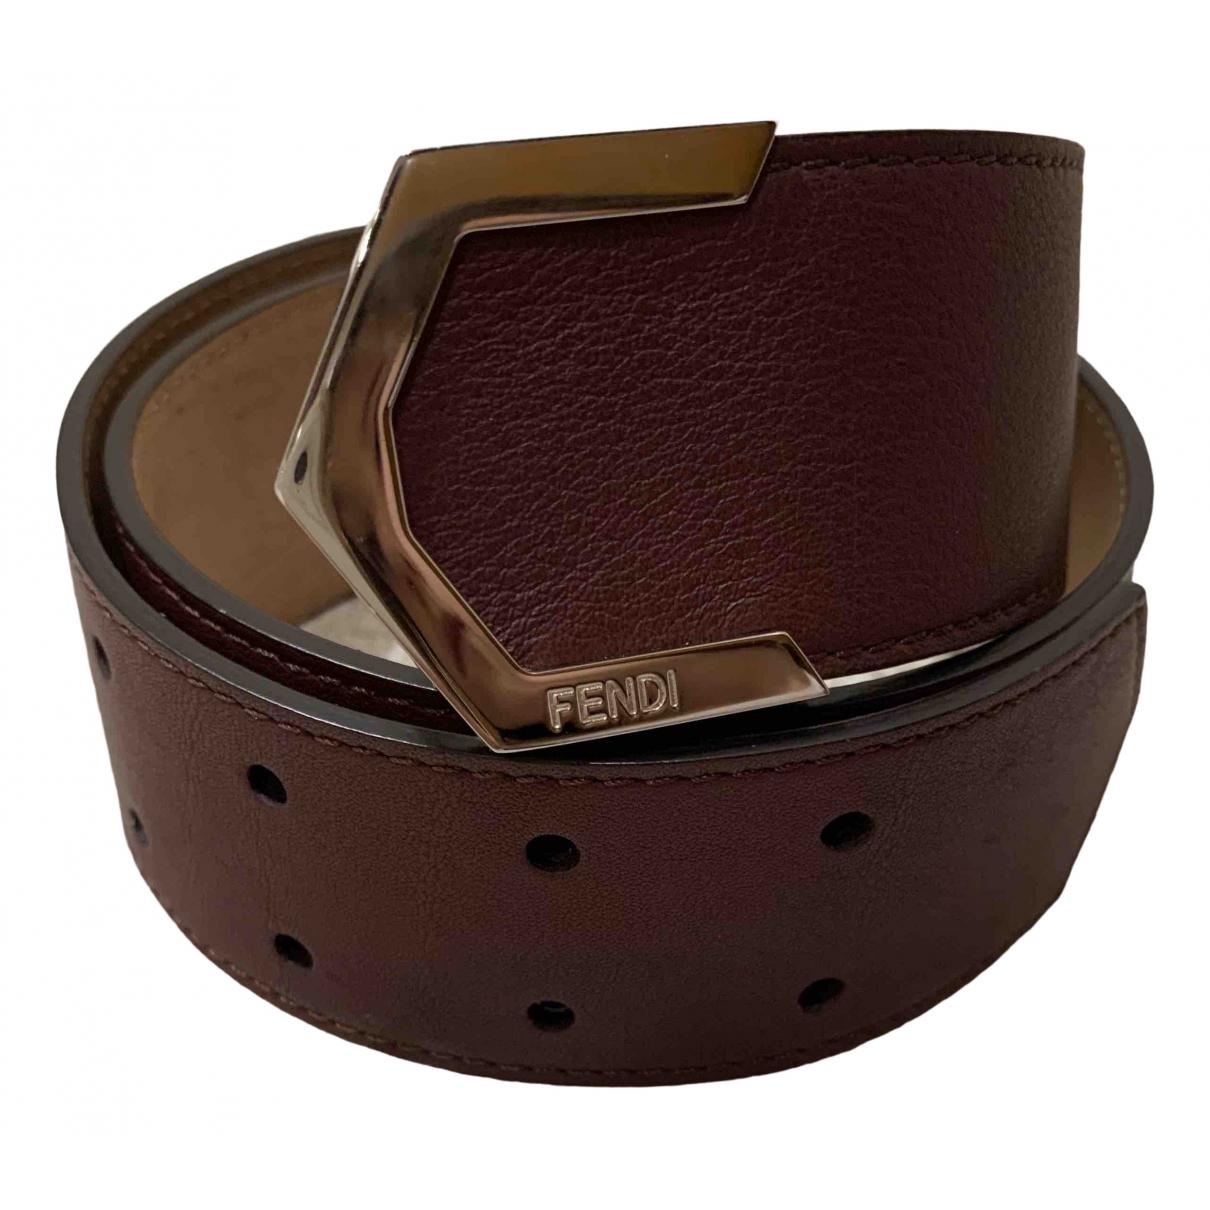 Fendi \N Burgundy Leather belt for Women XXS International